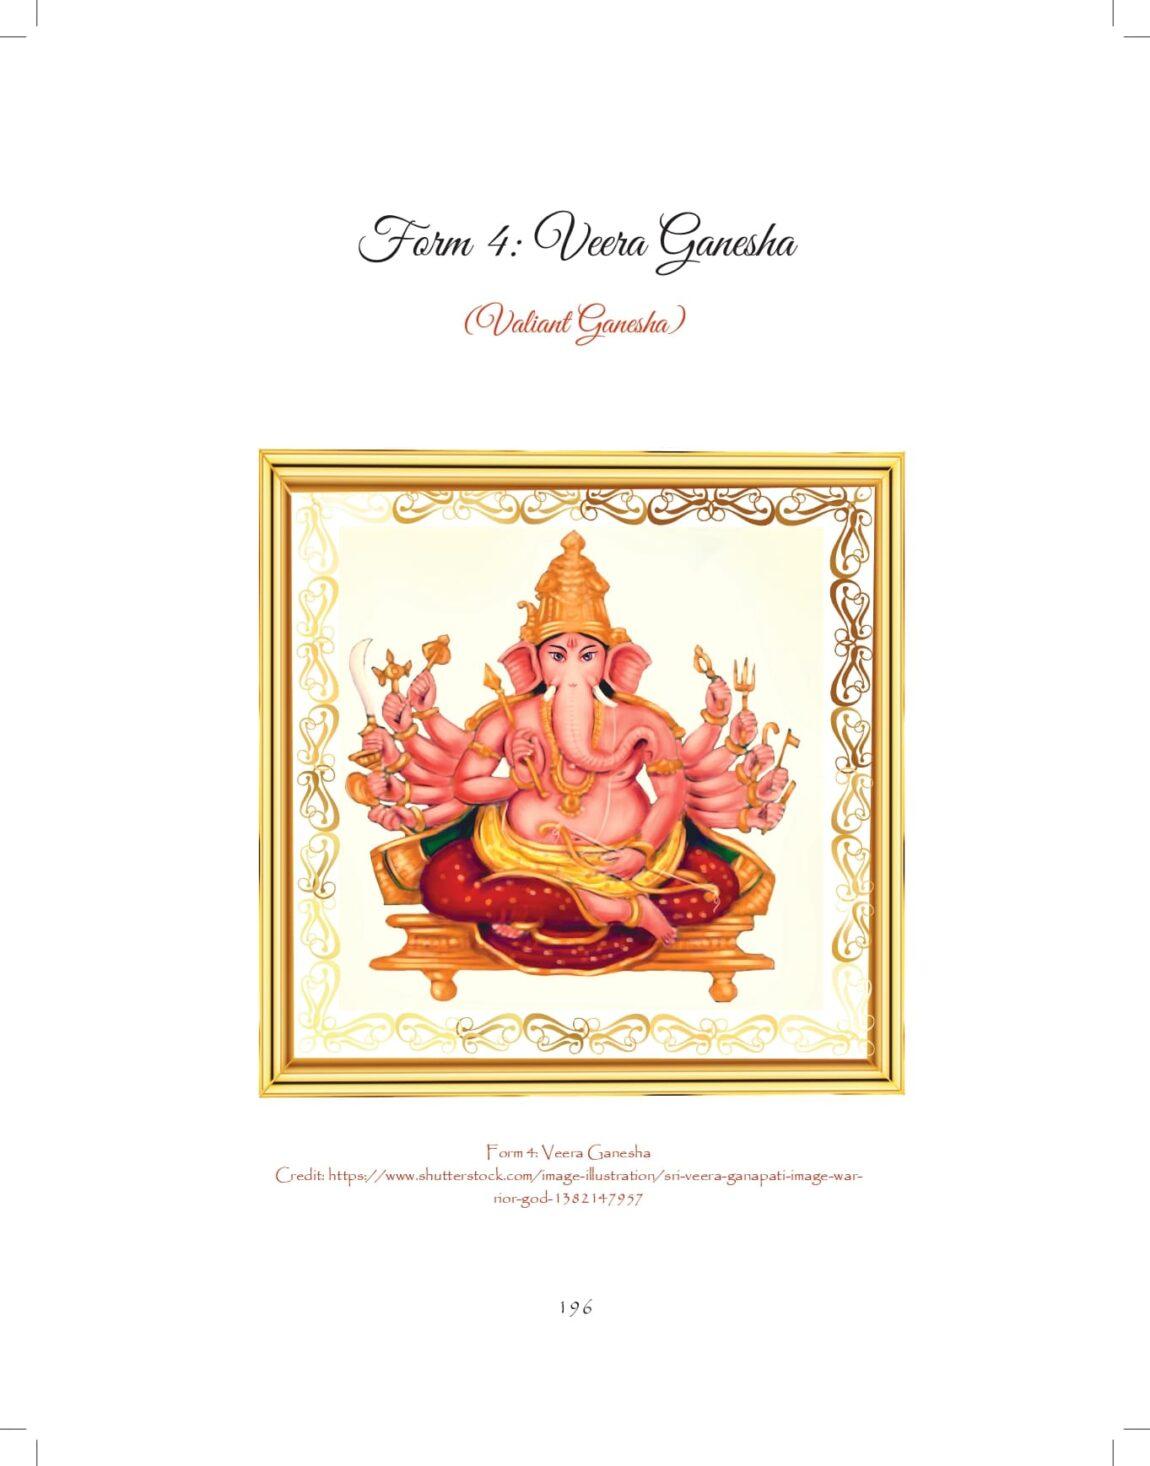 Ganesh-print_pages-to-jpg-0196.jpg